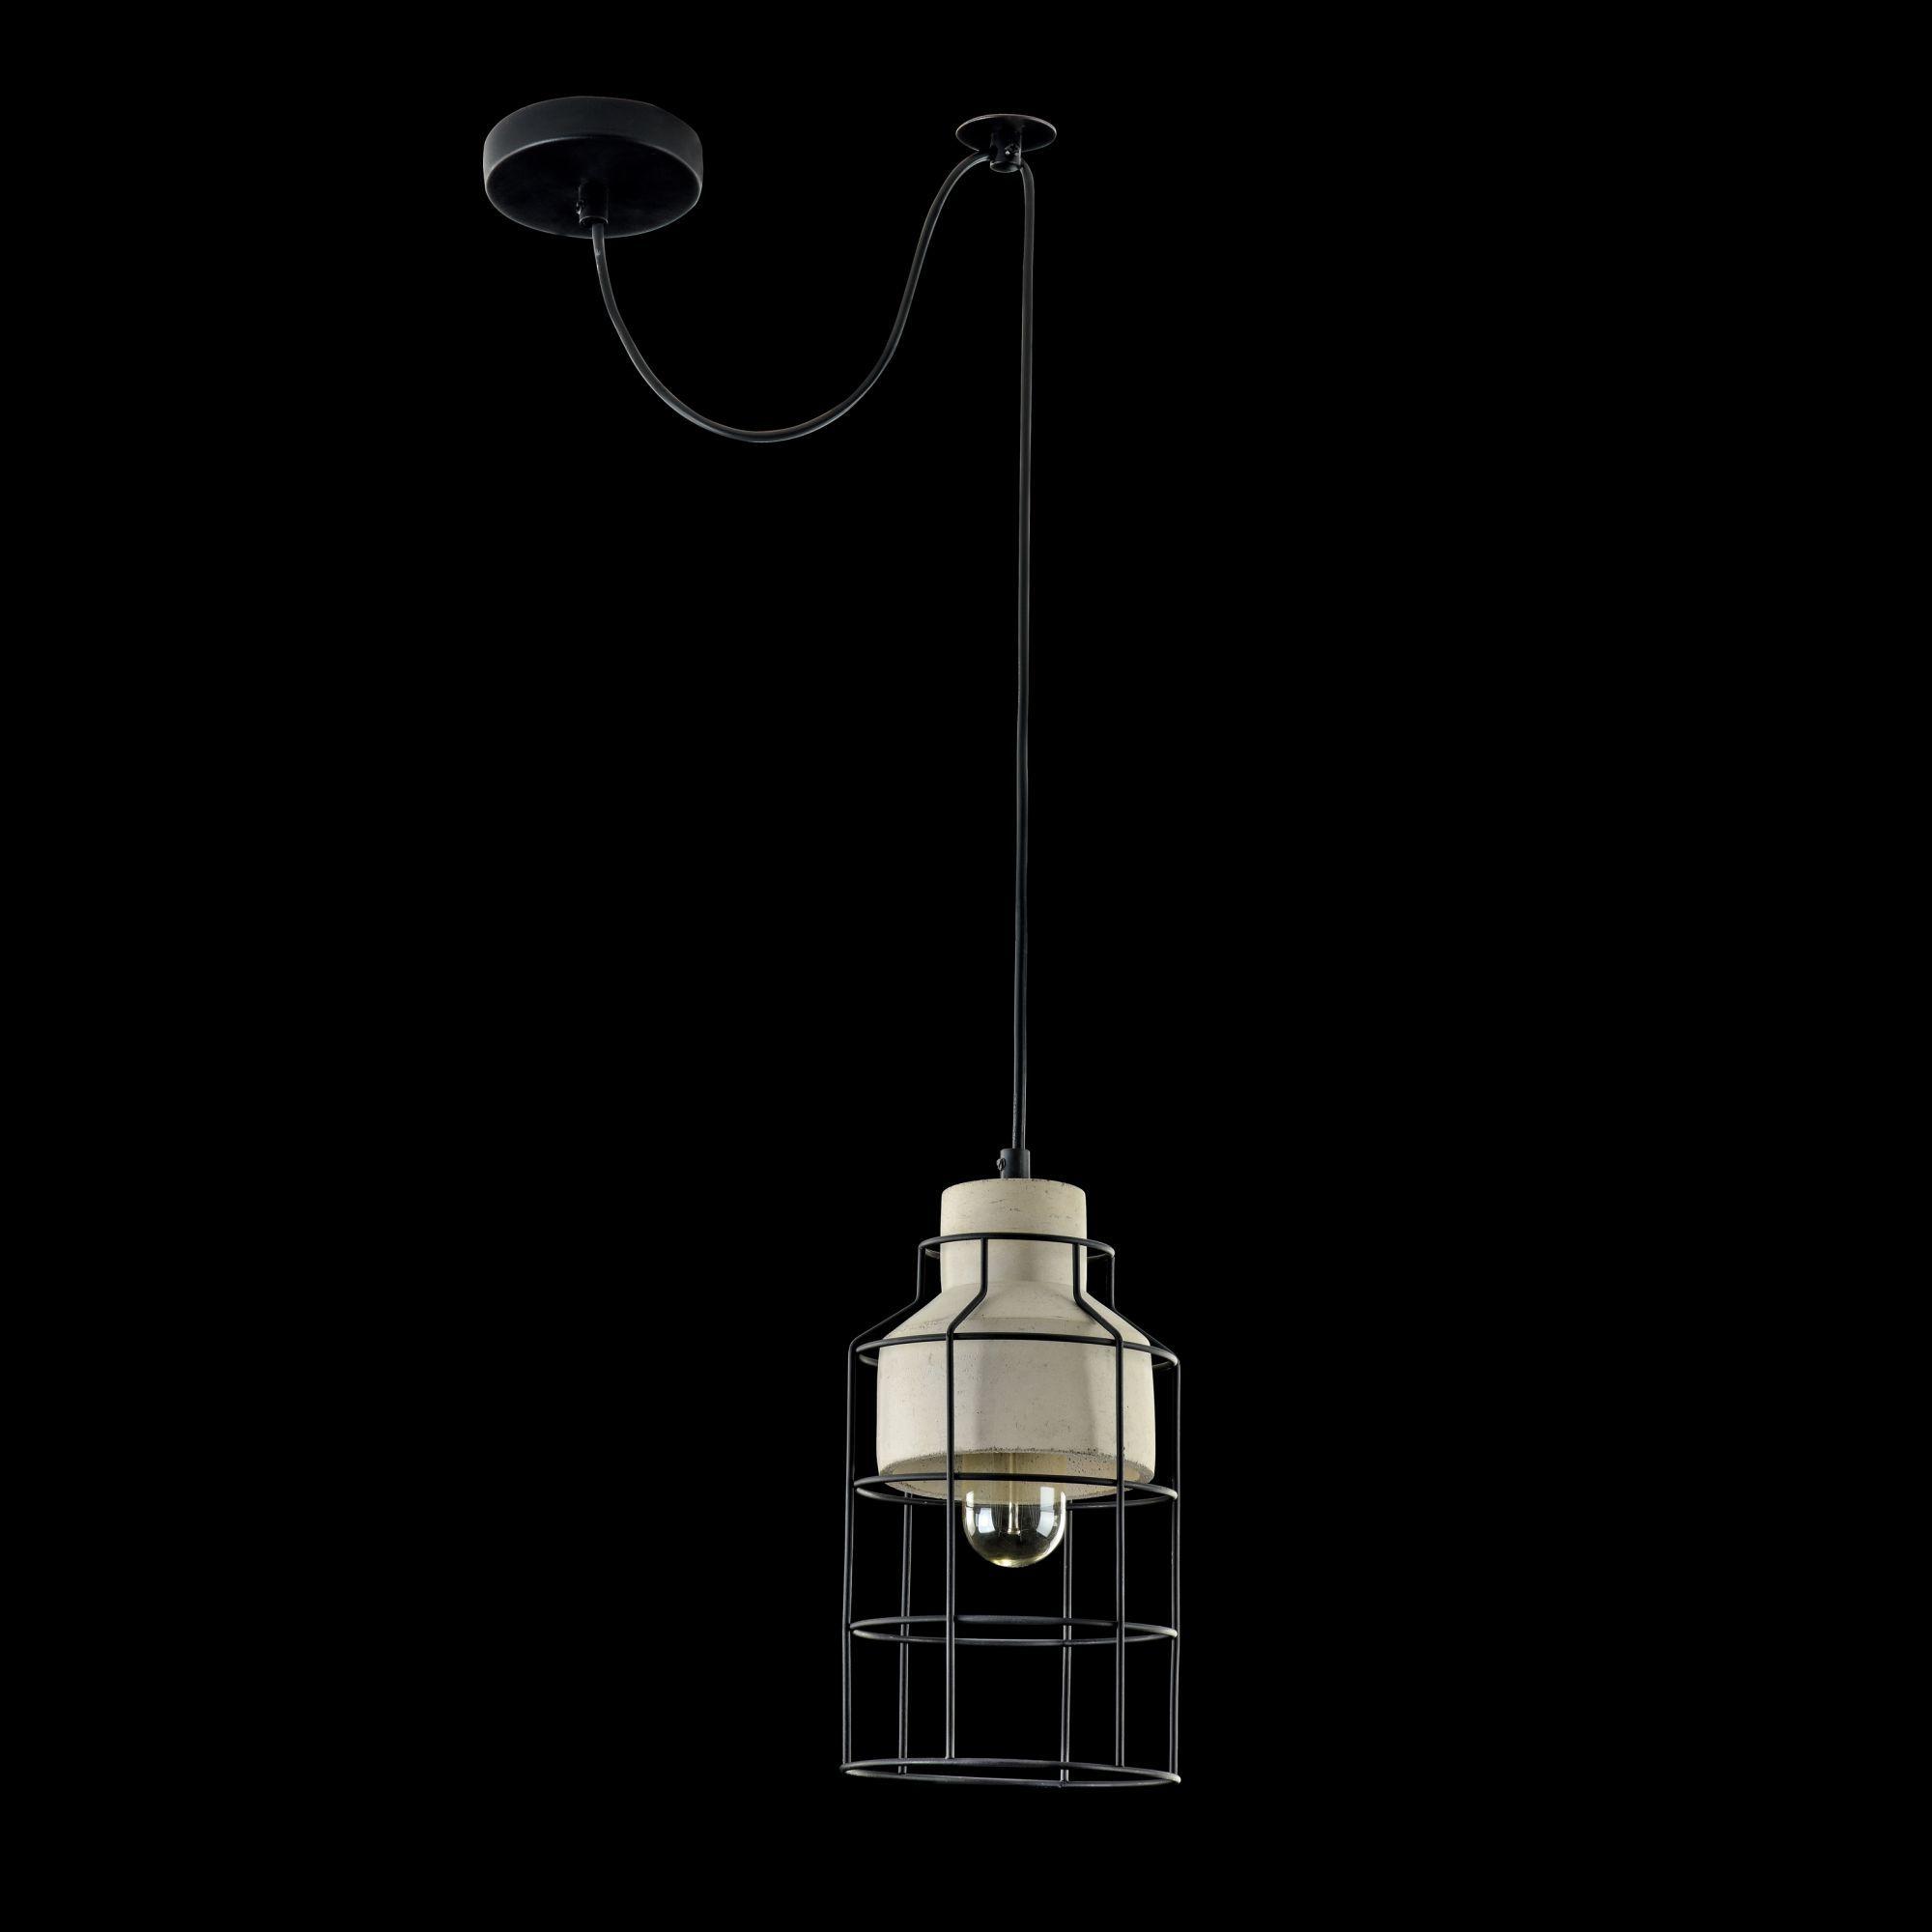 Подвесной светильник Maytoni Gosford T441-PL-01-GR, 1xE27x60W, черный, серый, металл, бетон - фото 2